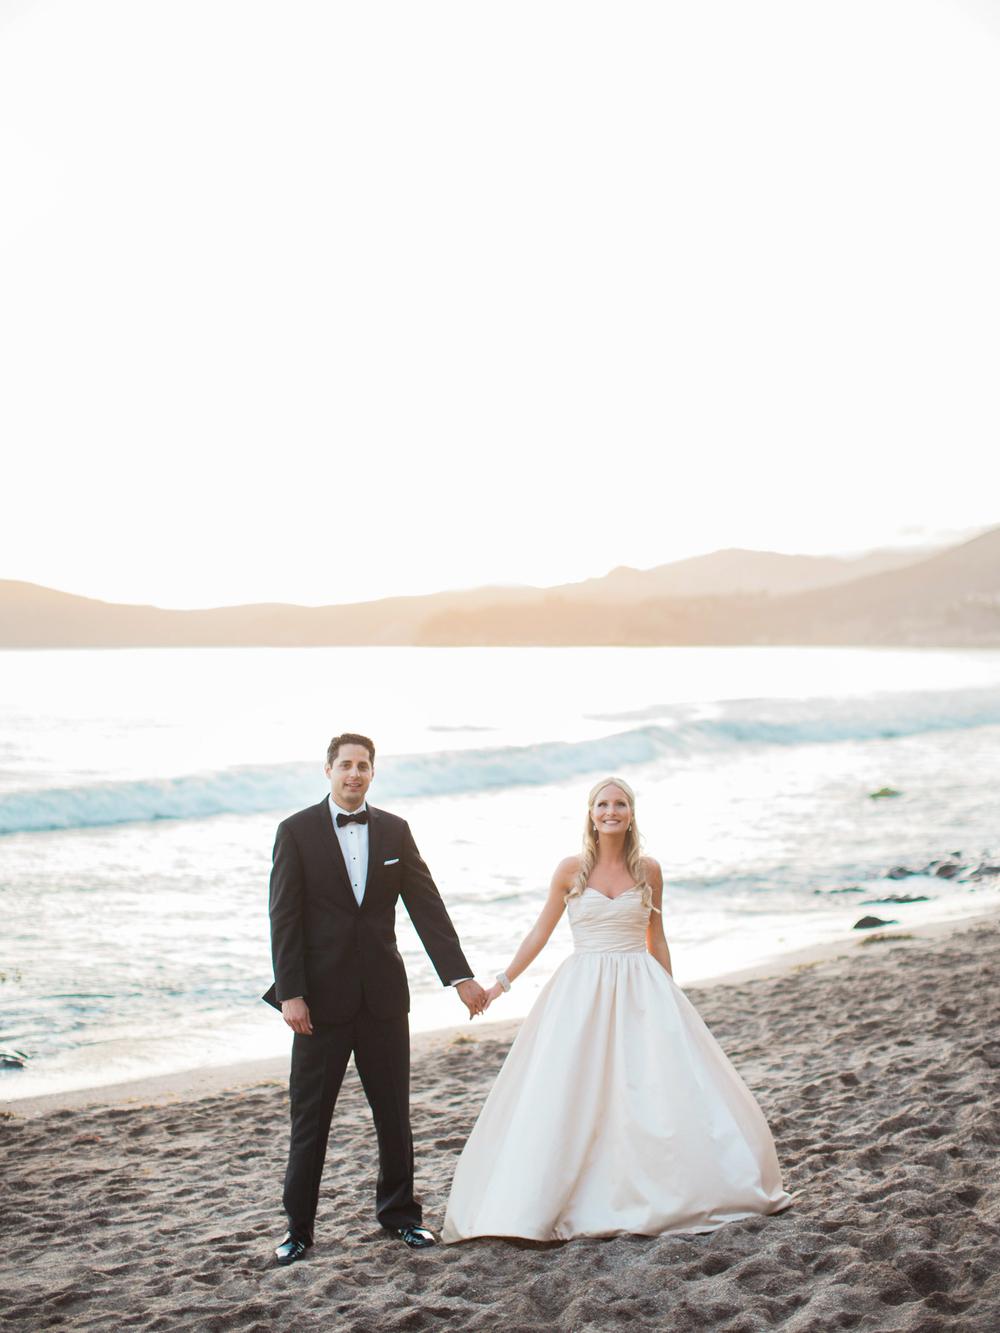 Santa Barbara Wedding Photographer Skyla Walton (1 of 7).jpg